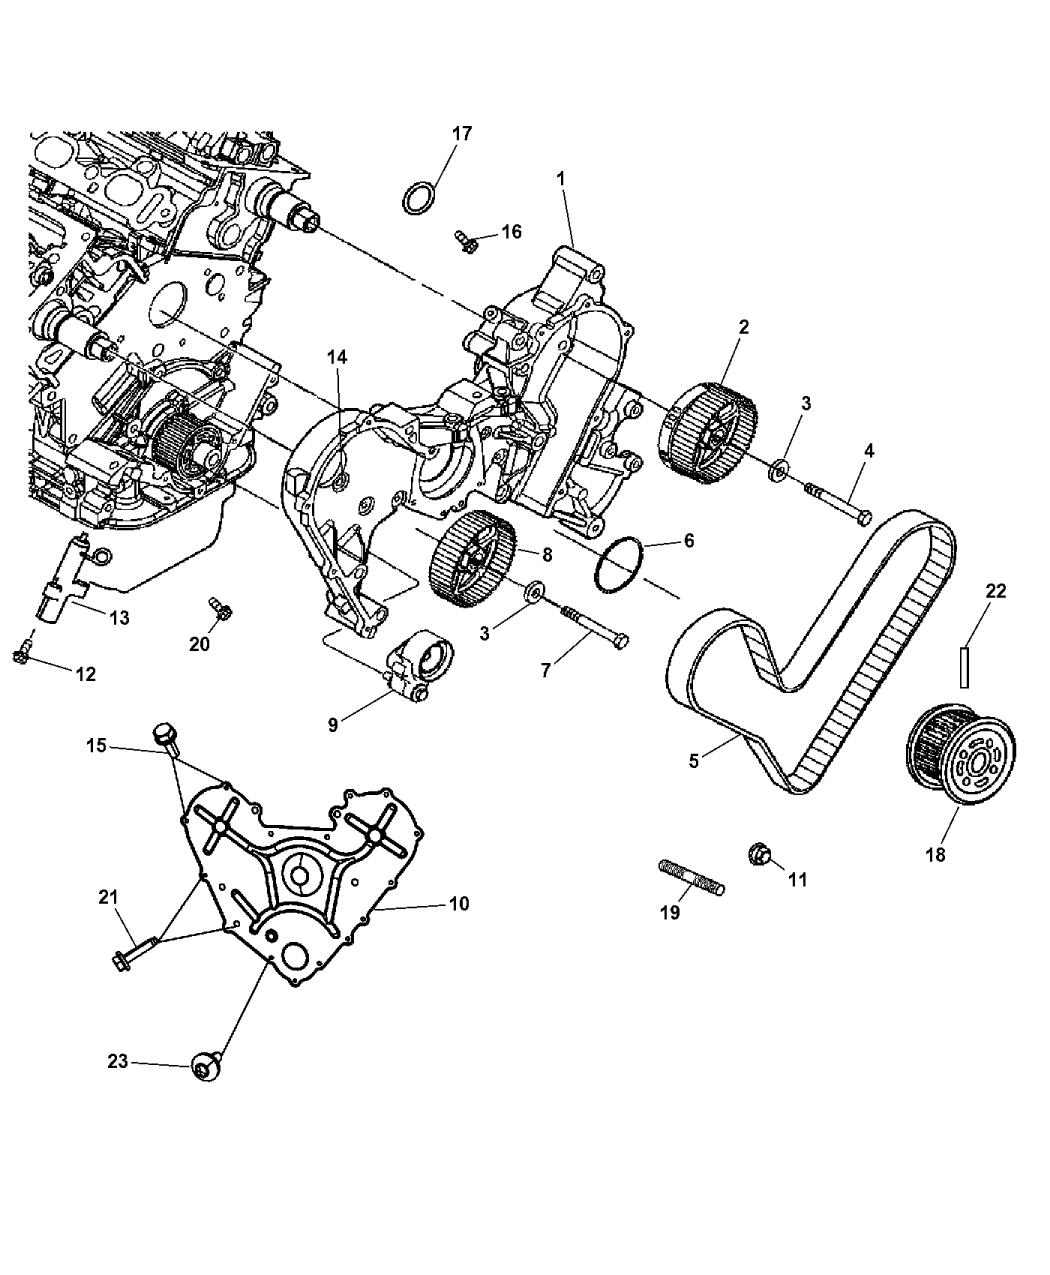 2009 dodge nitro engine timing diagram diagram of a 2009 dodge nitro engine